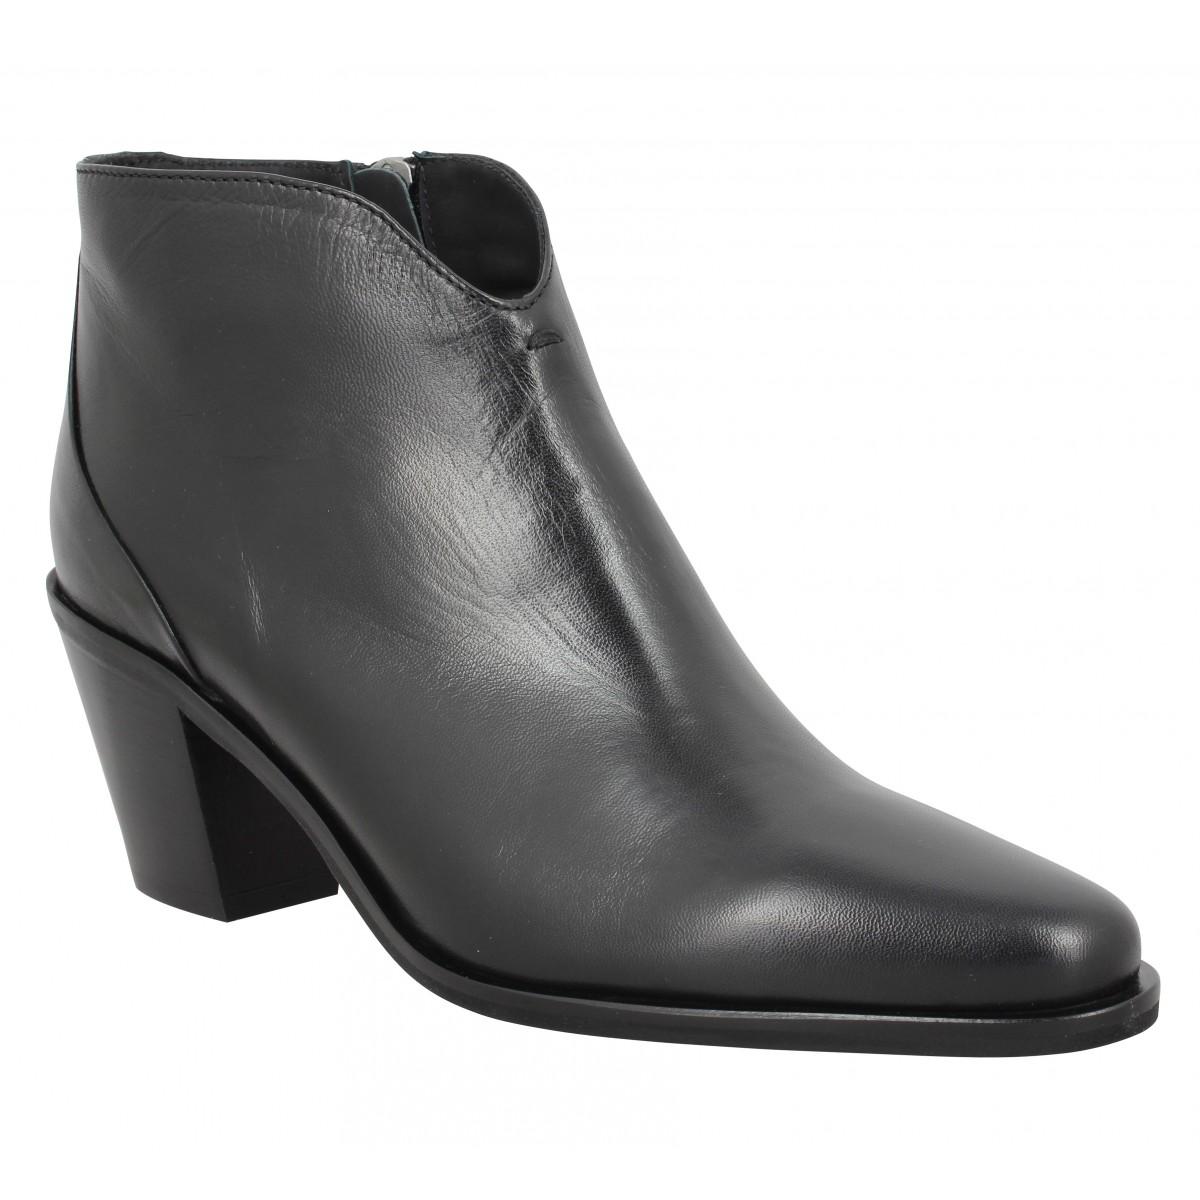 Bottines TRIVER FLIGHT 41720 cuir Femme Noir